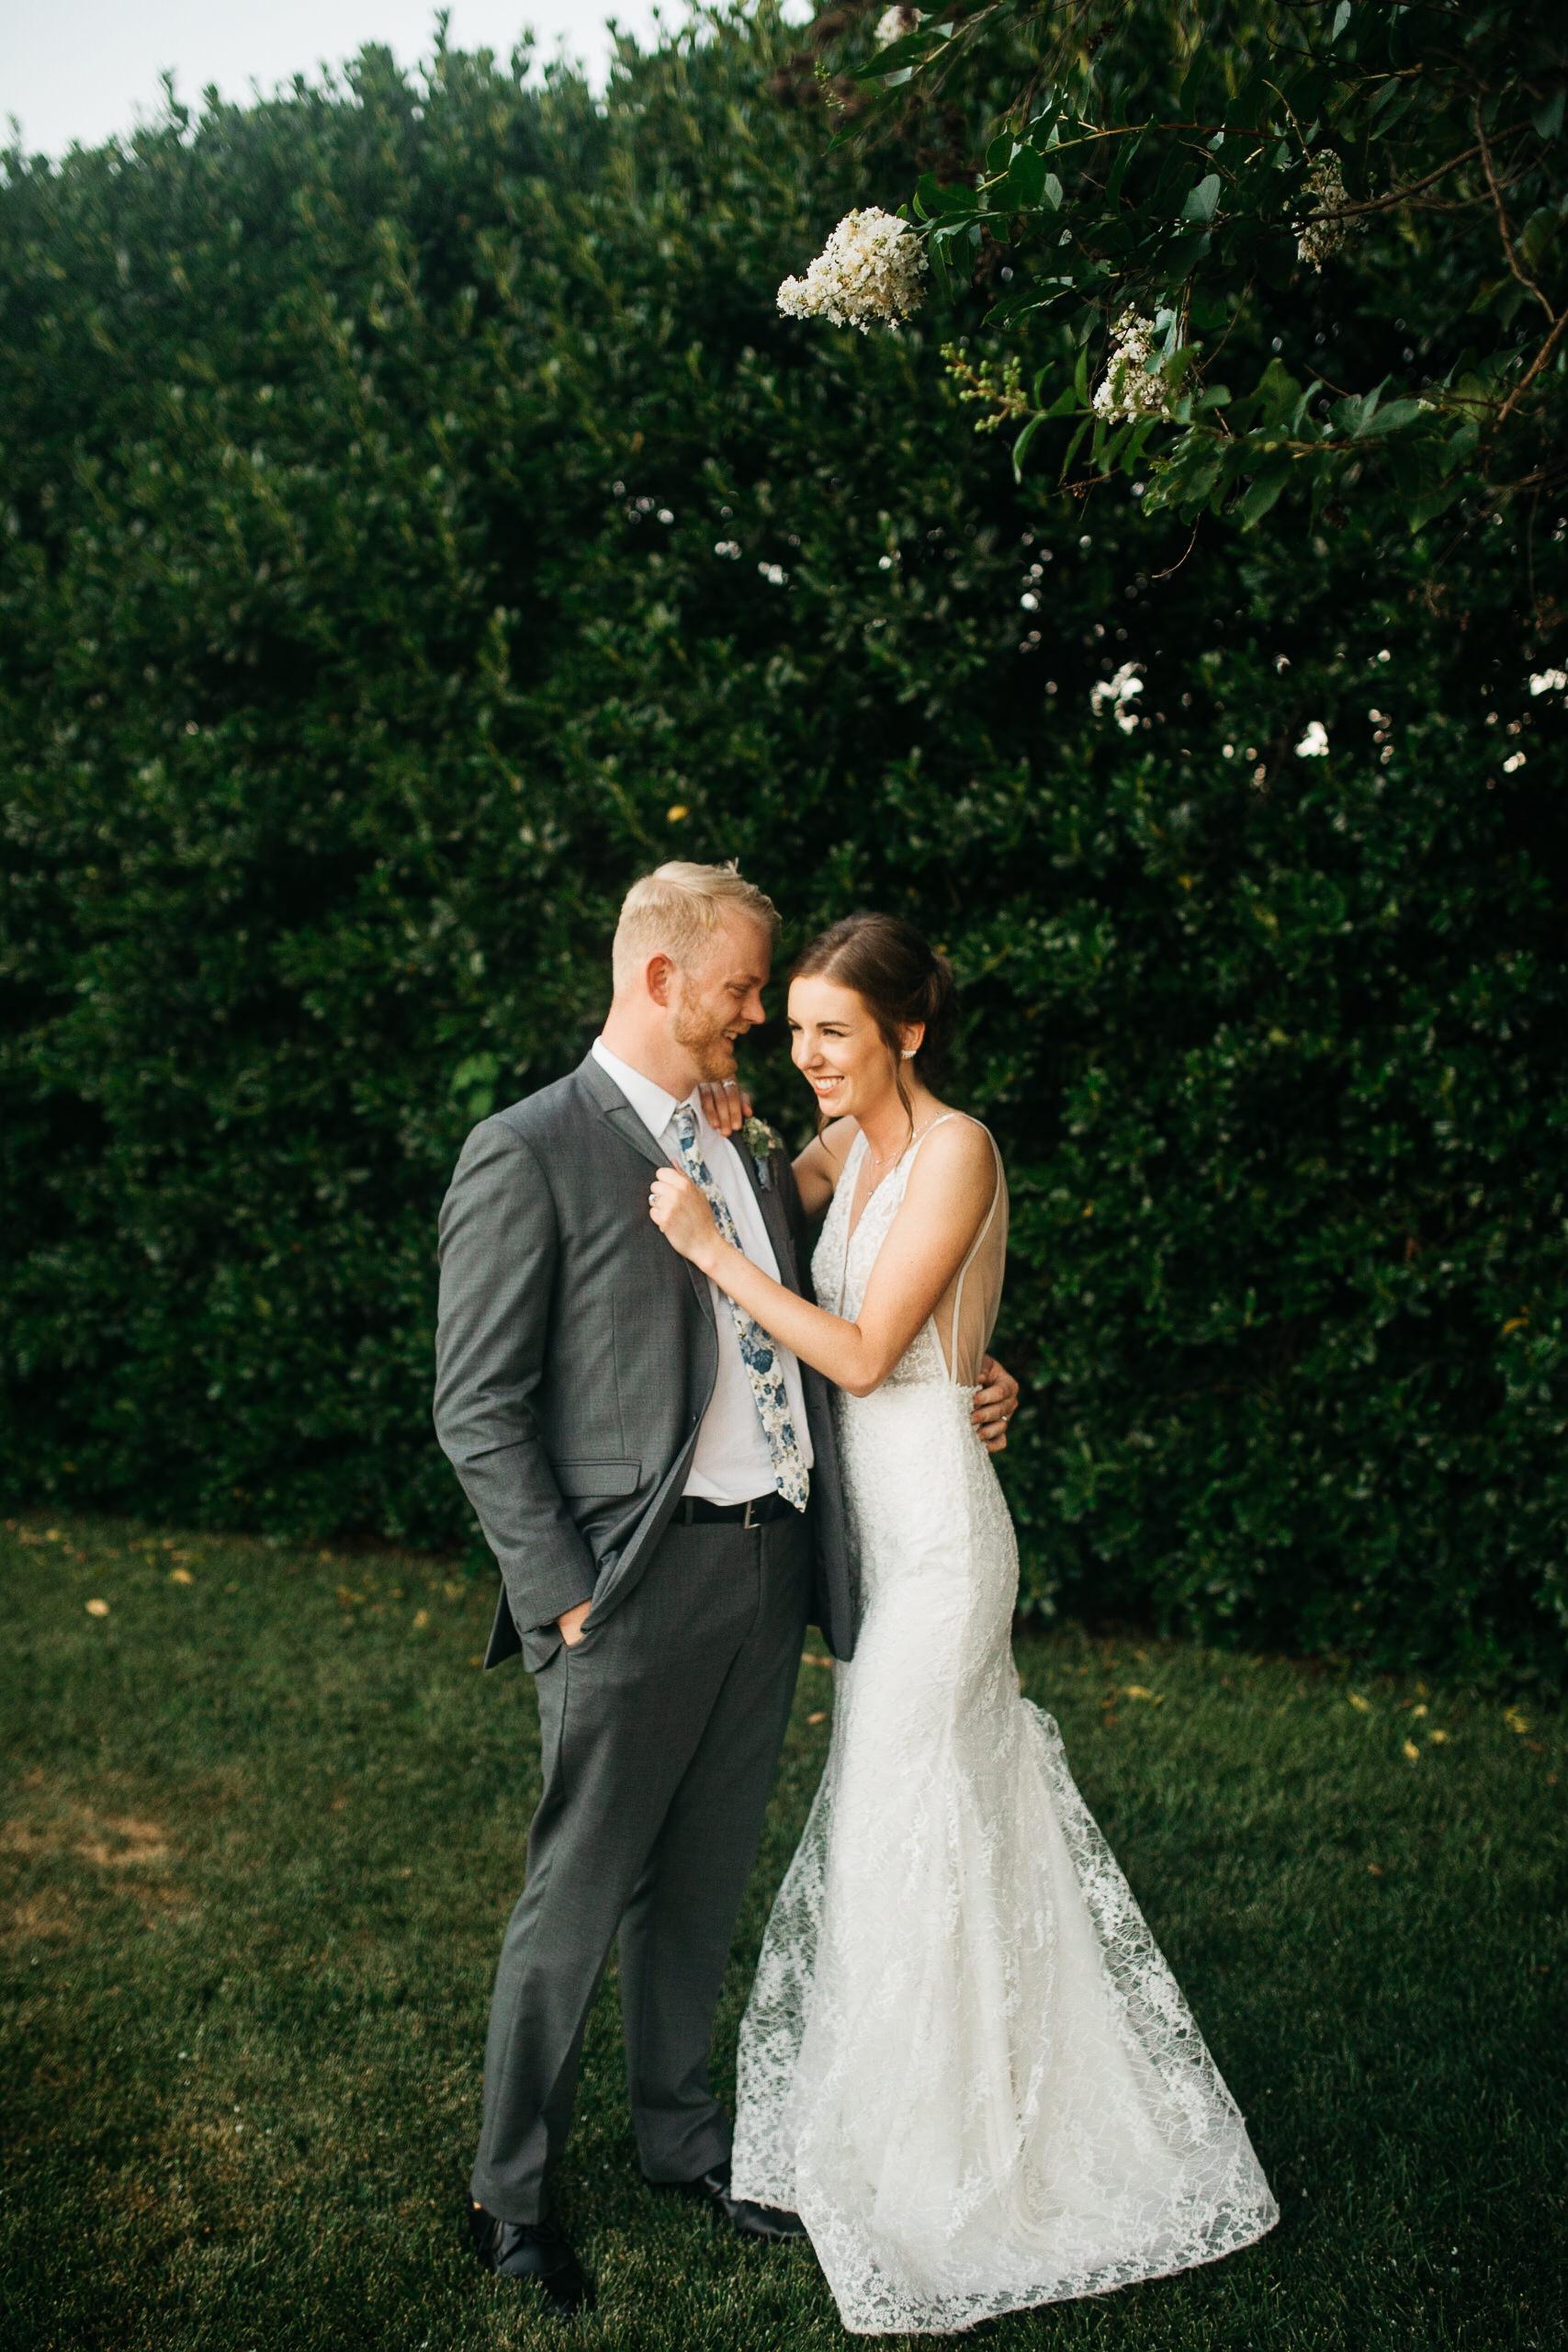 okc-wedding-photographer-coles-garden-wedding-okc-best-wedding-photographers-159.jpg